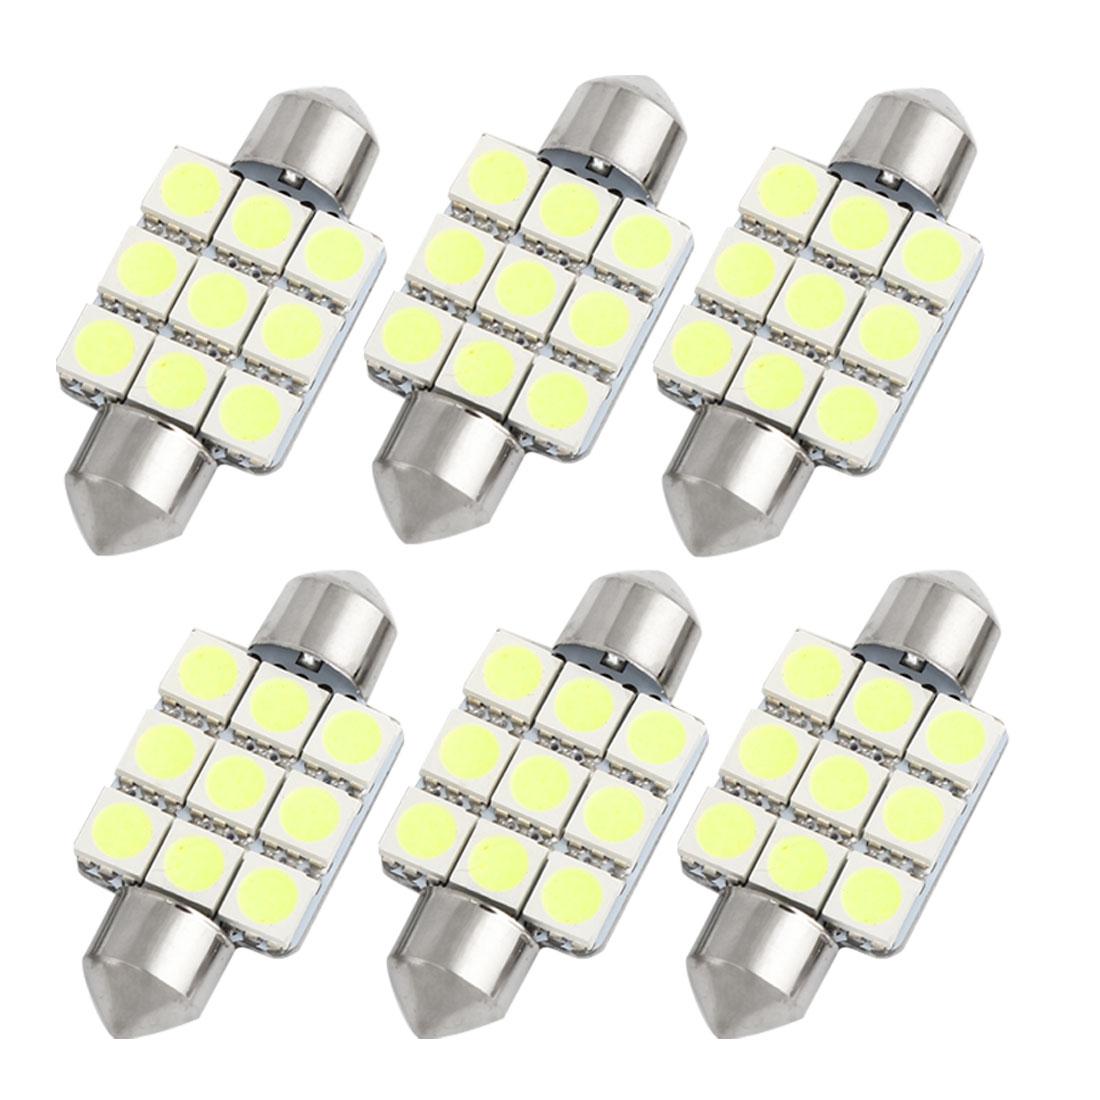 6pcs 36mm White 9 LED 5050 SMD Festoon Dome Light Lamp DE3423 DE3425 Internal